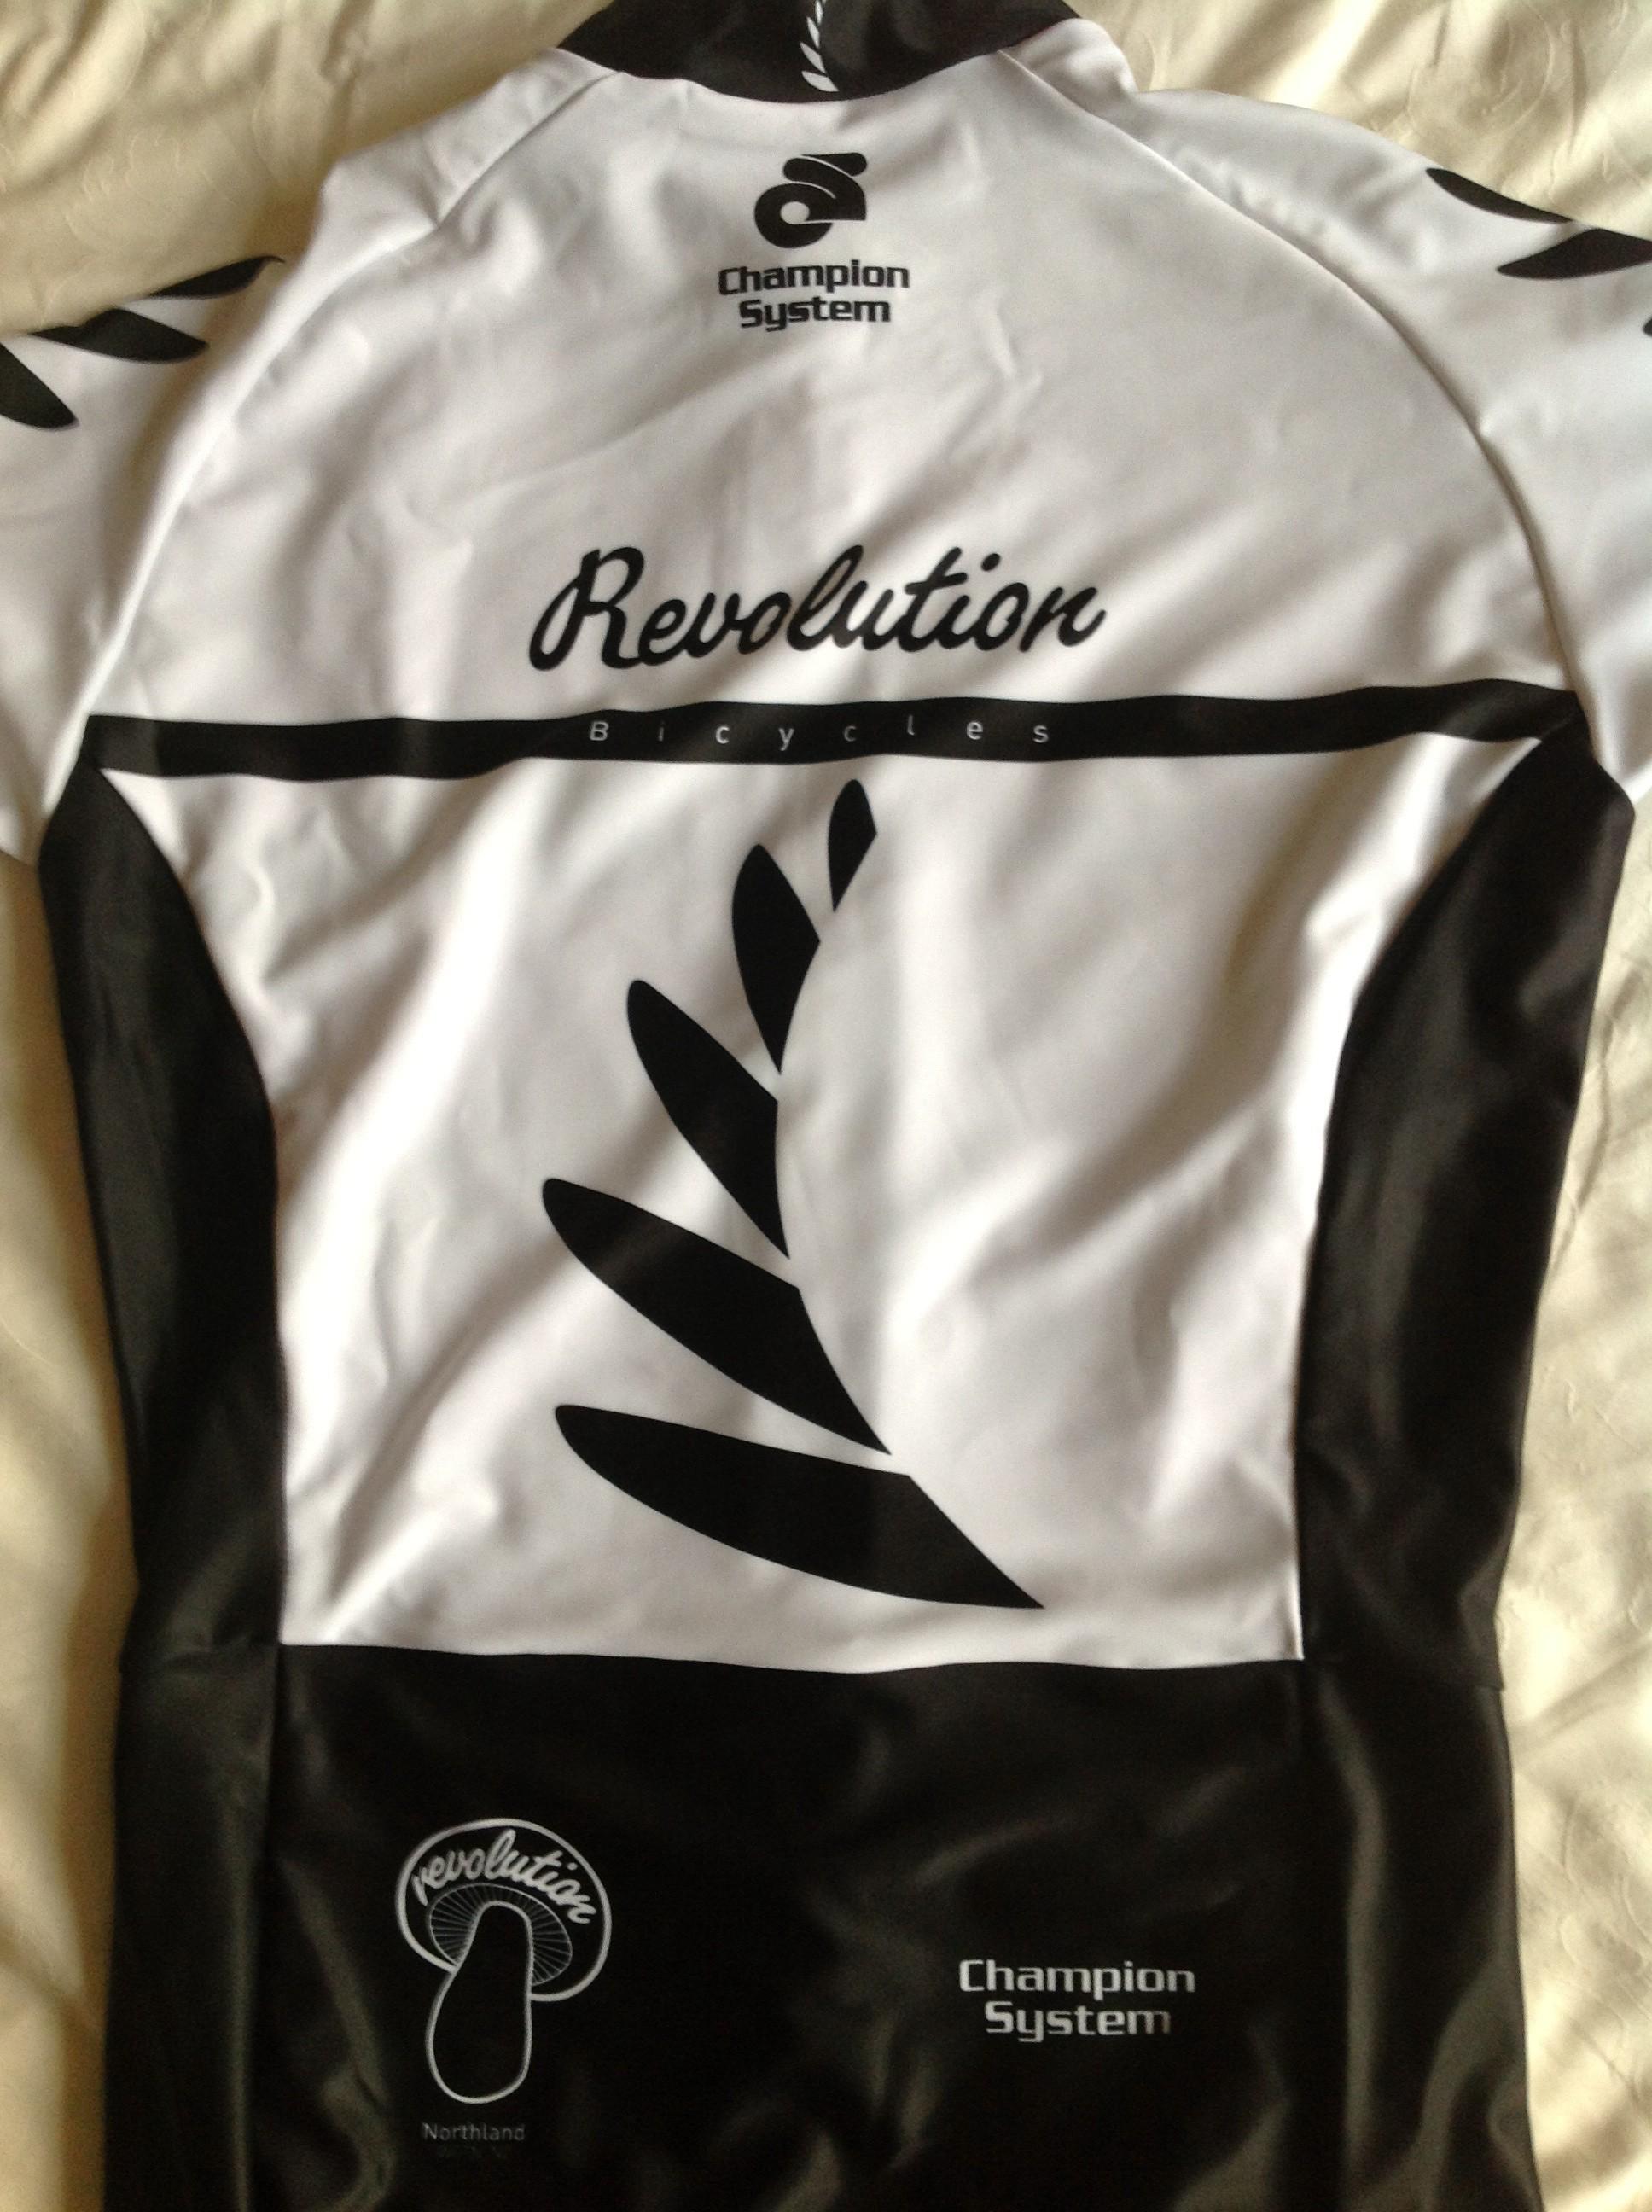 Revolution NZ skinsuit rear